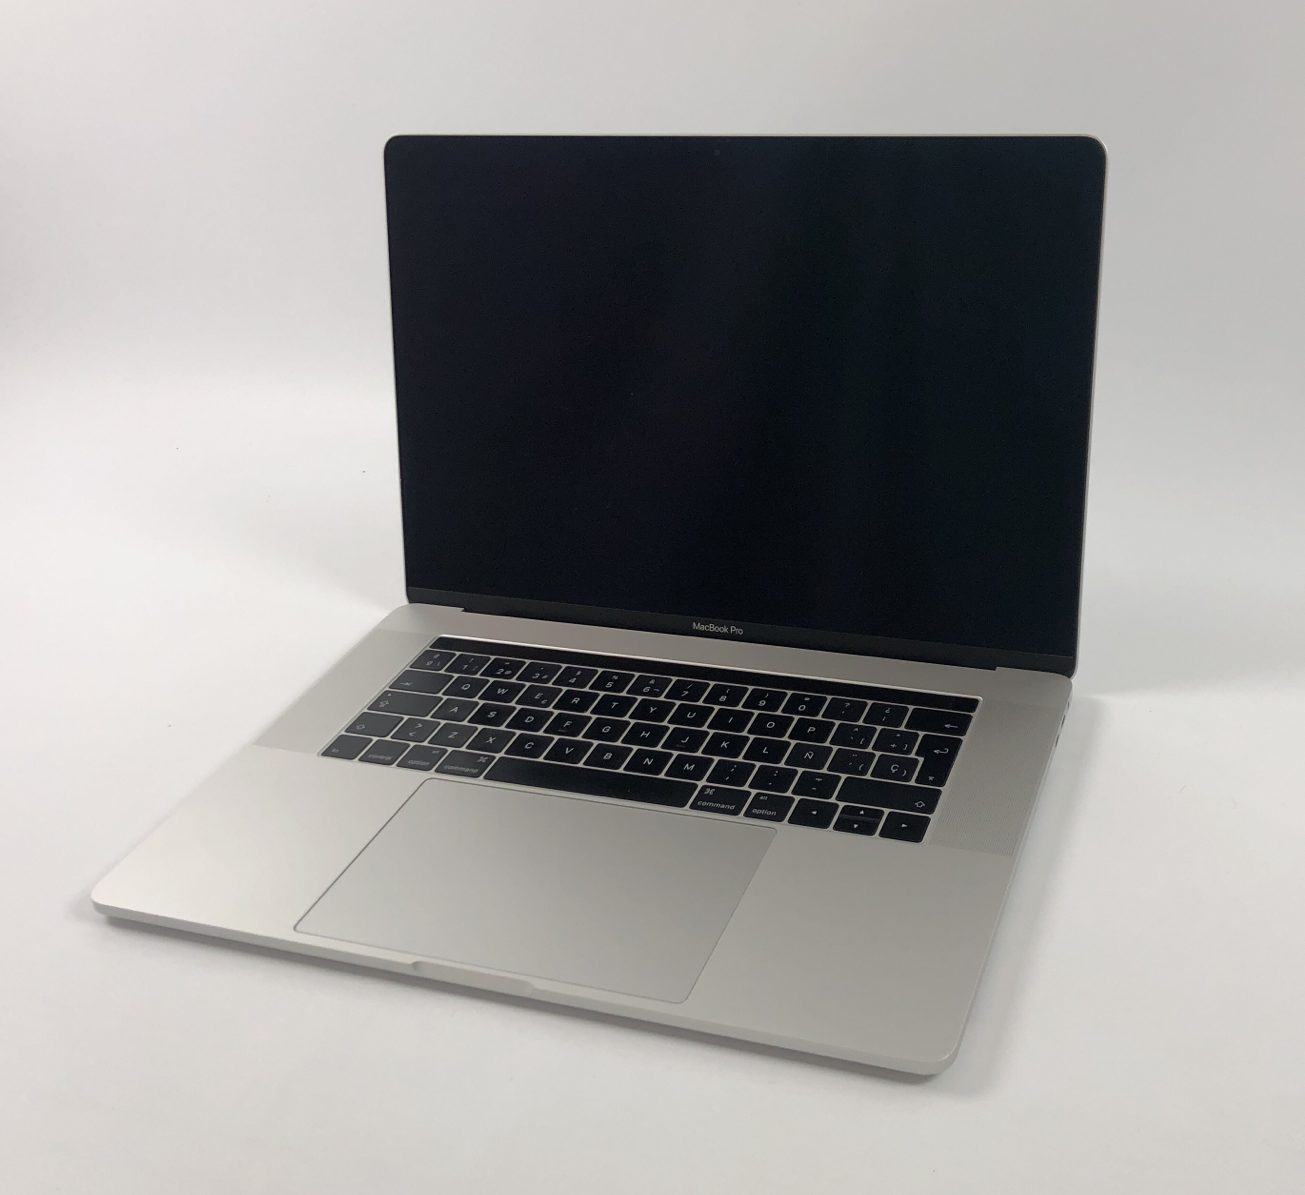 "MacBook Pro 15"" Touch Bar Late 2016 (Intel Quad-Core i7 2.7 GHz 16 GB RAM 512 GB SSD), Silver, Intel Quad-Core i7 2.7 GHz, 16 GB RAM, 512 GB SSD, imagen 2"